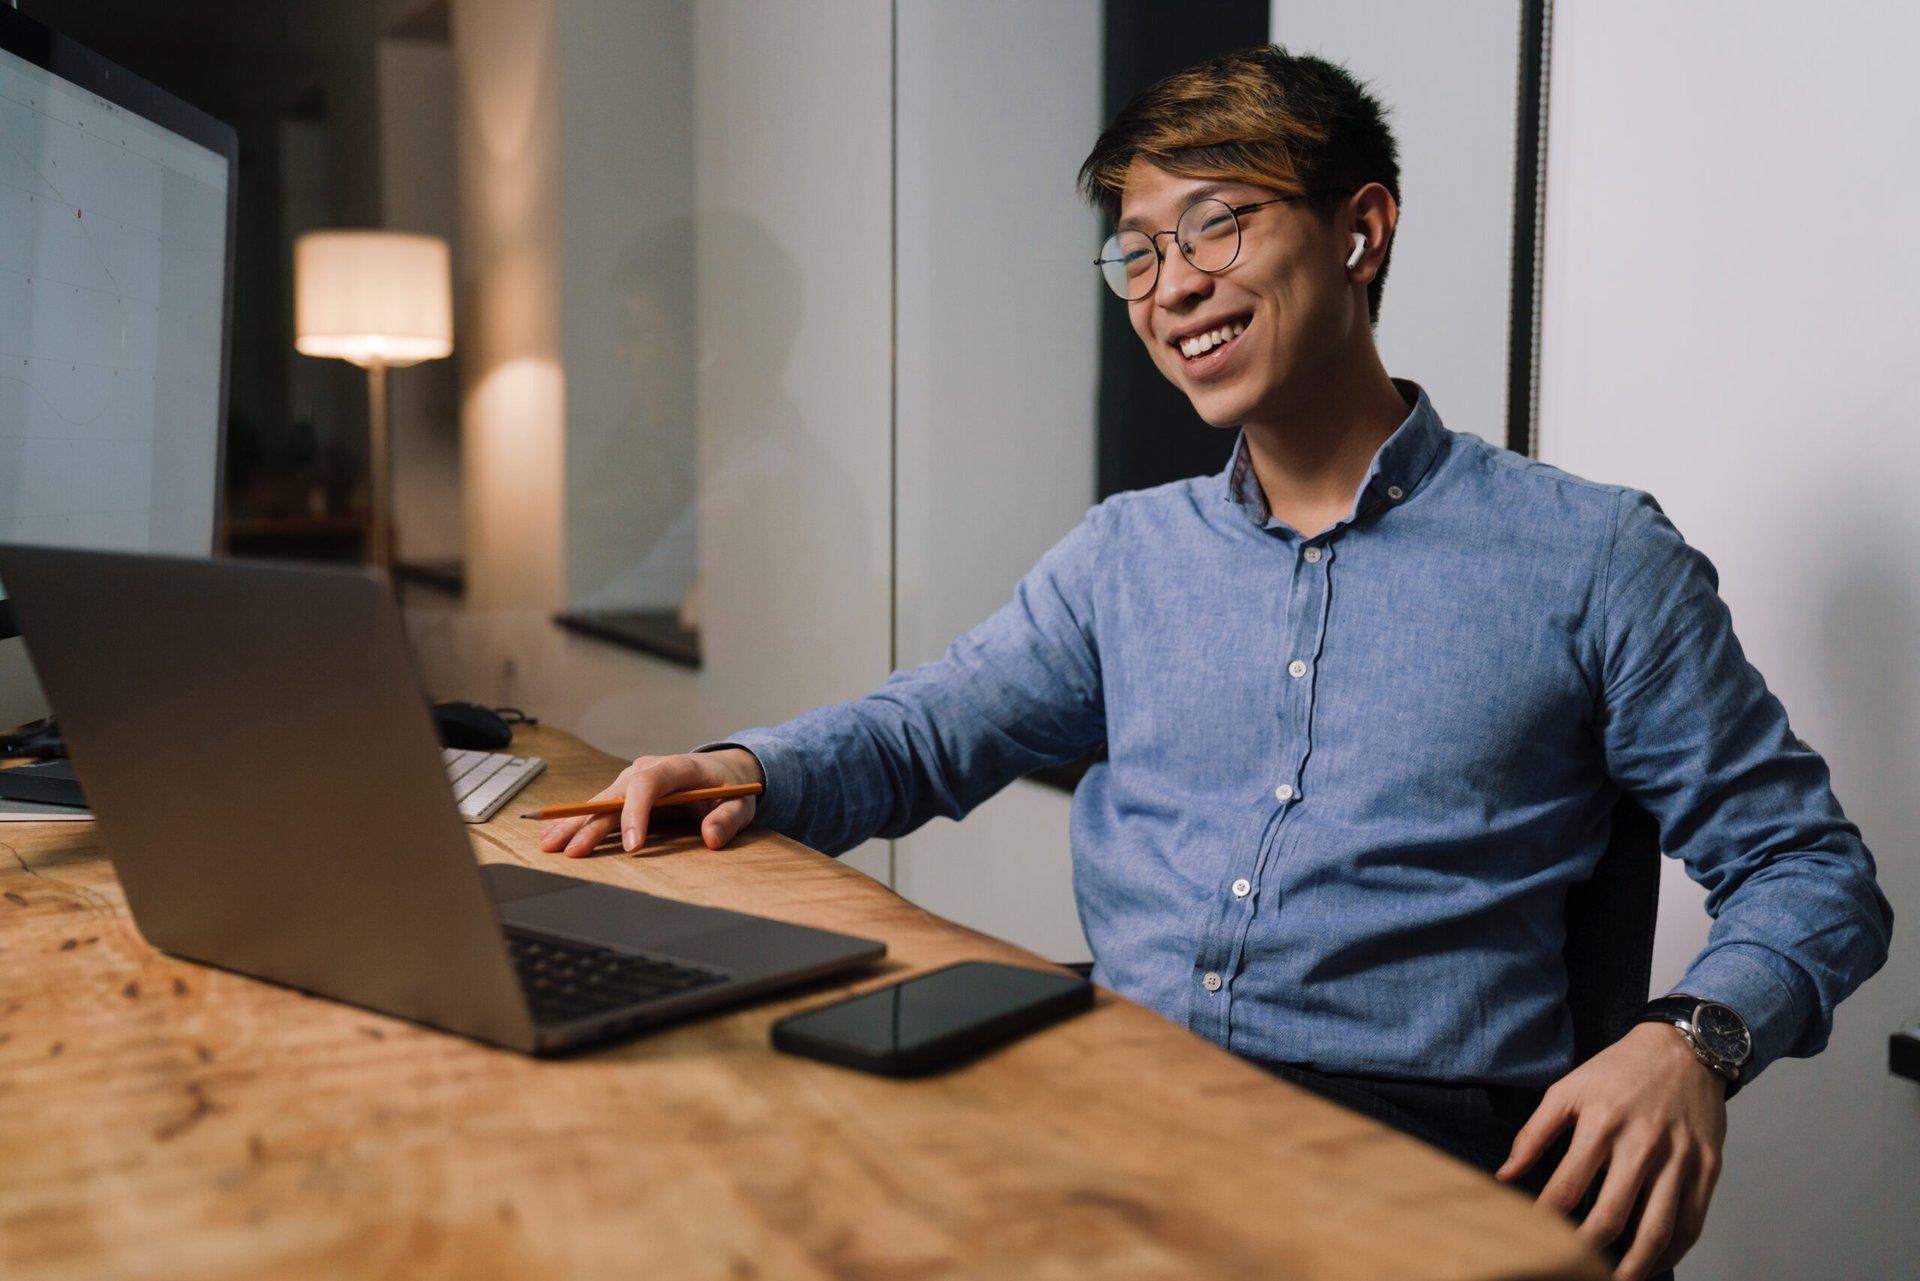 Happy guy at his computer